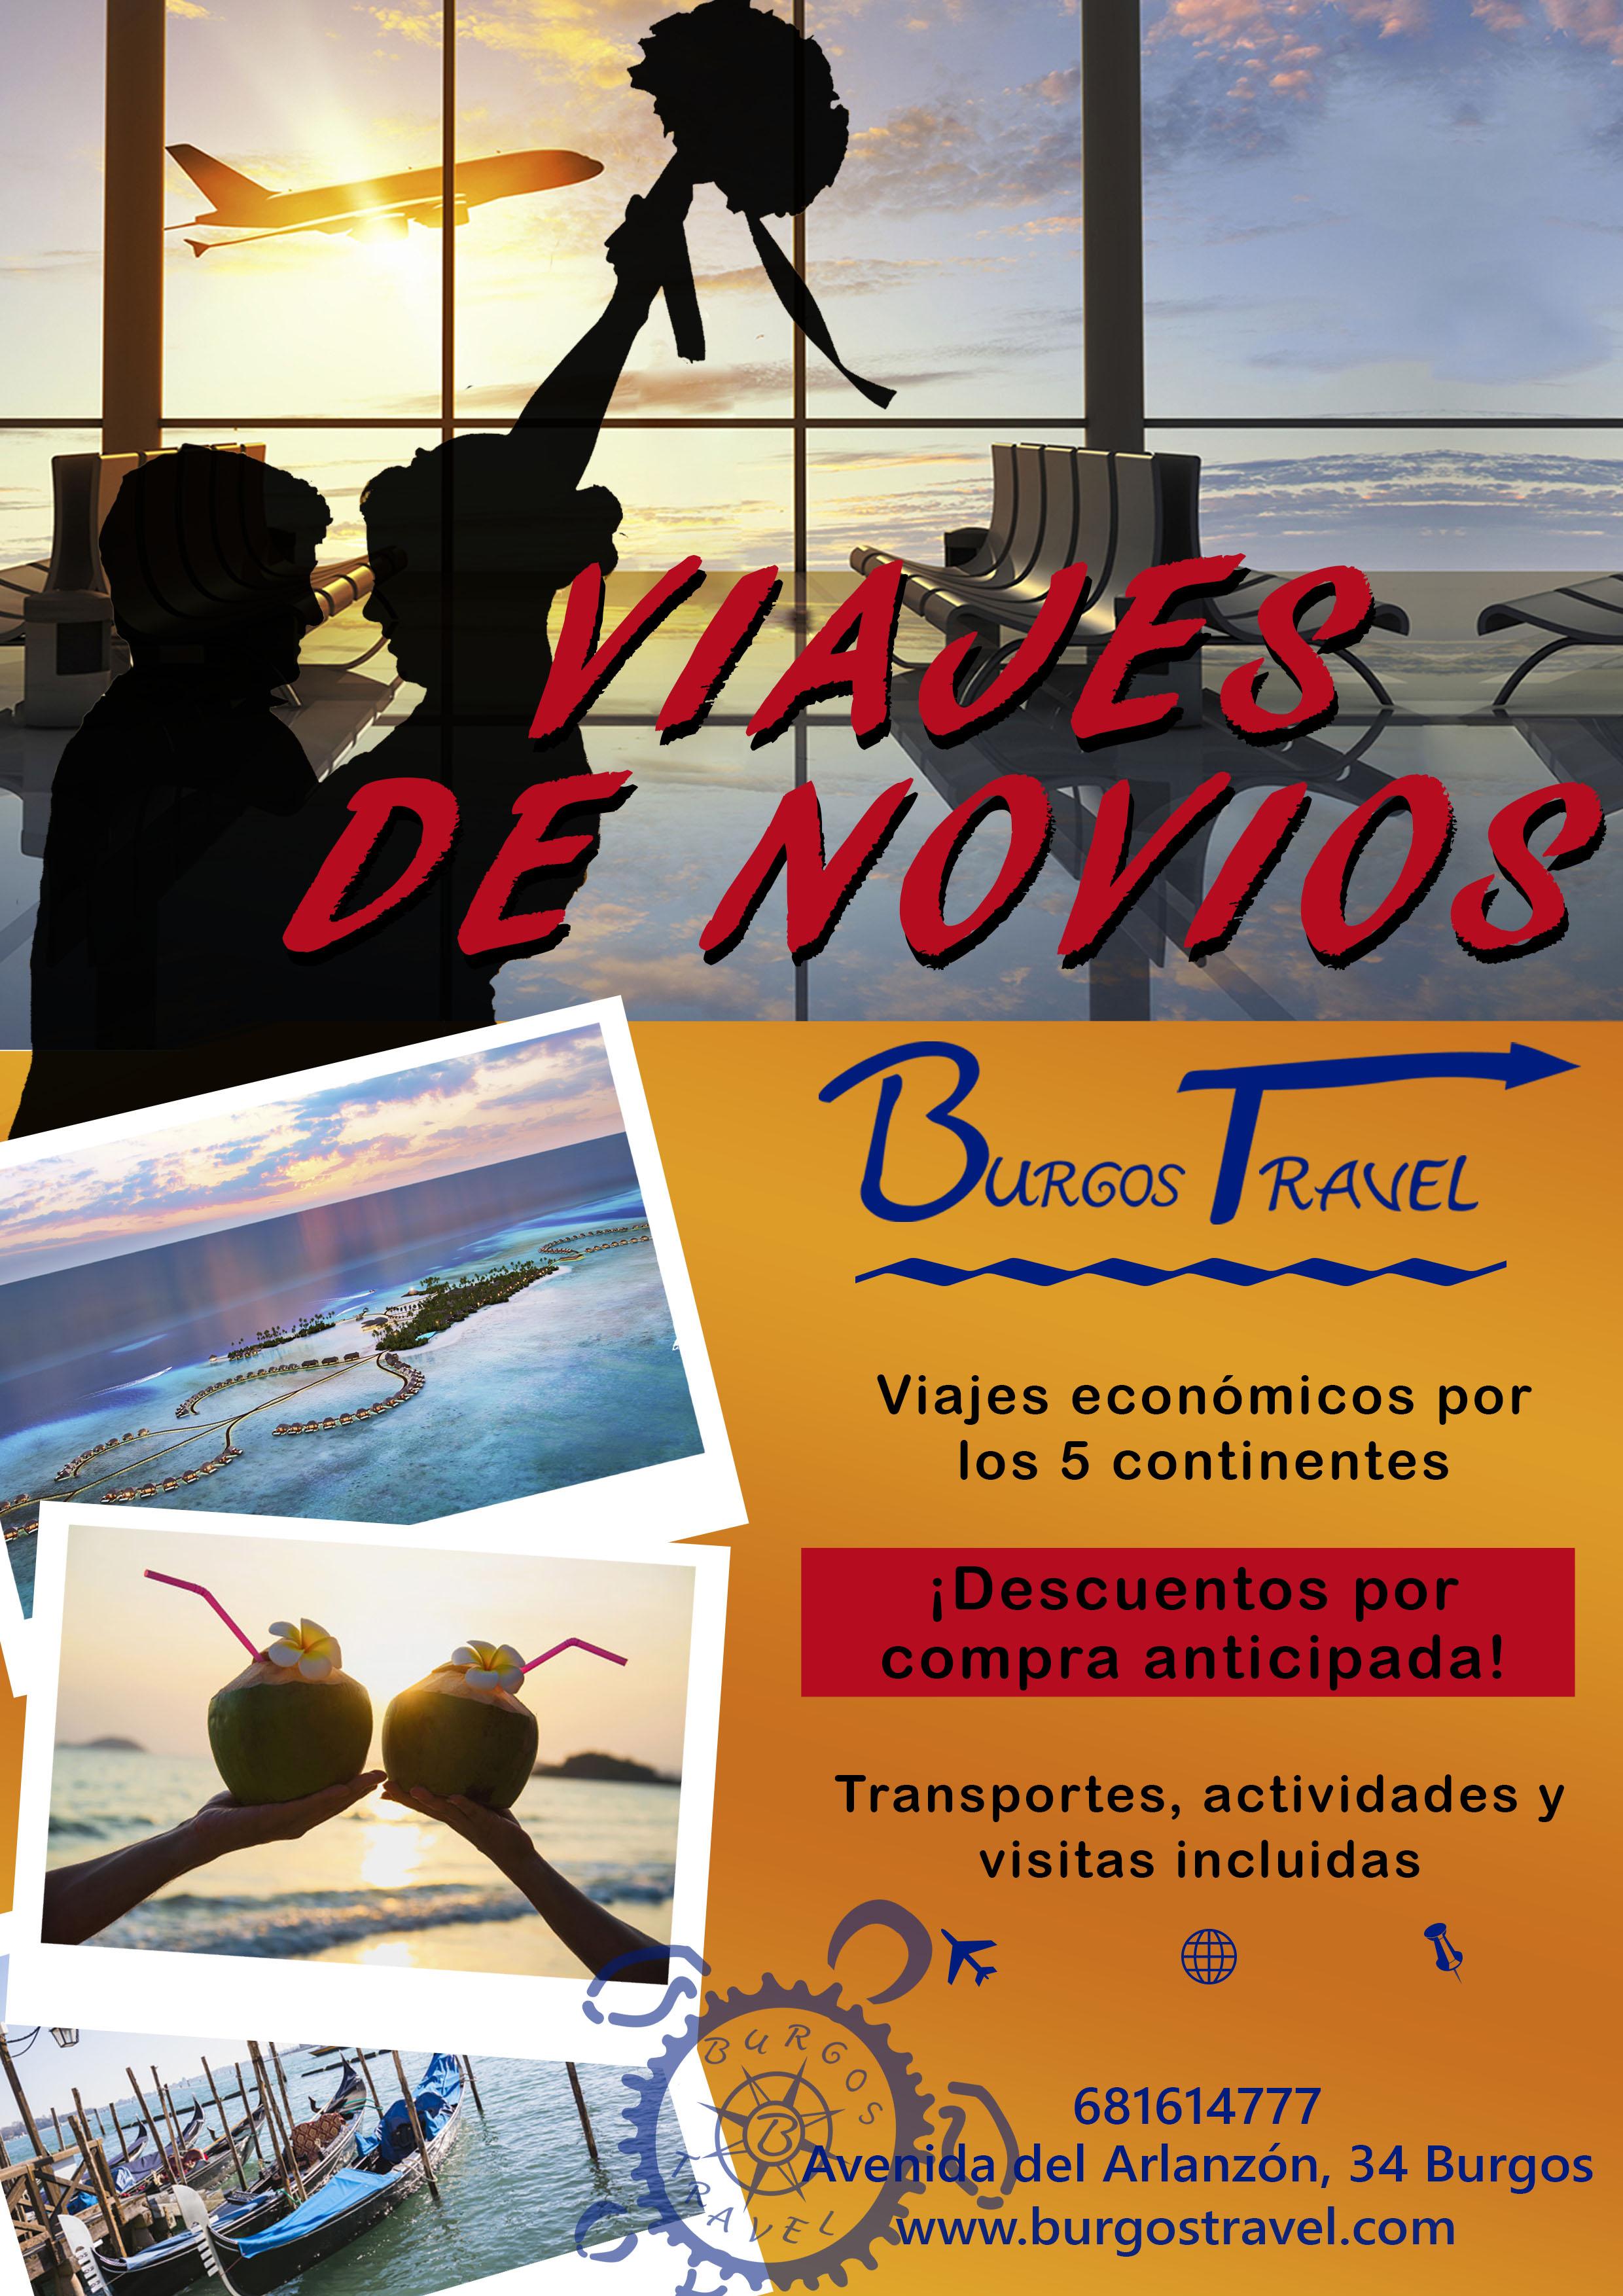 Viajes de novios Burgos Travel